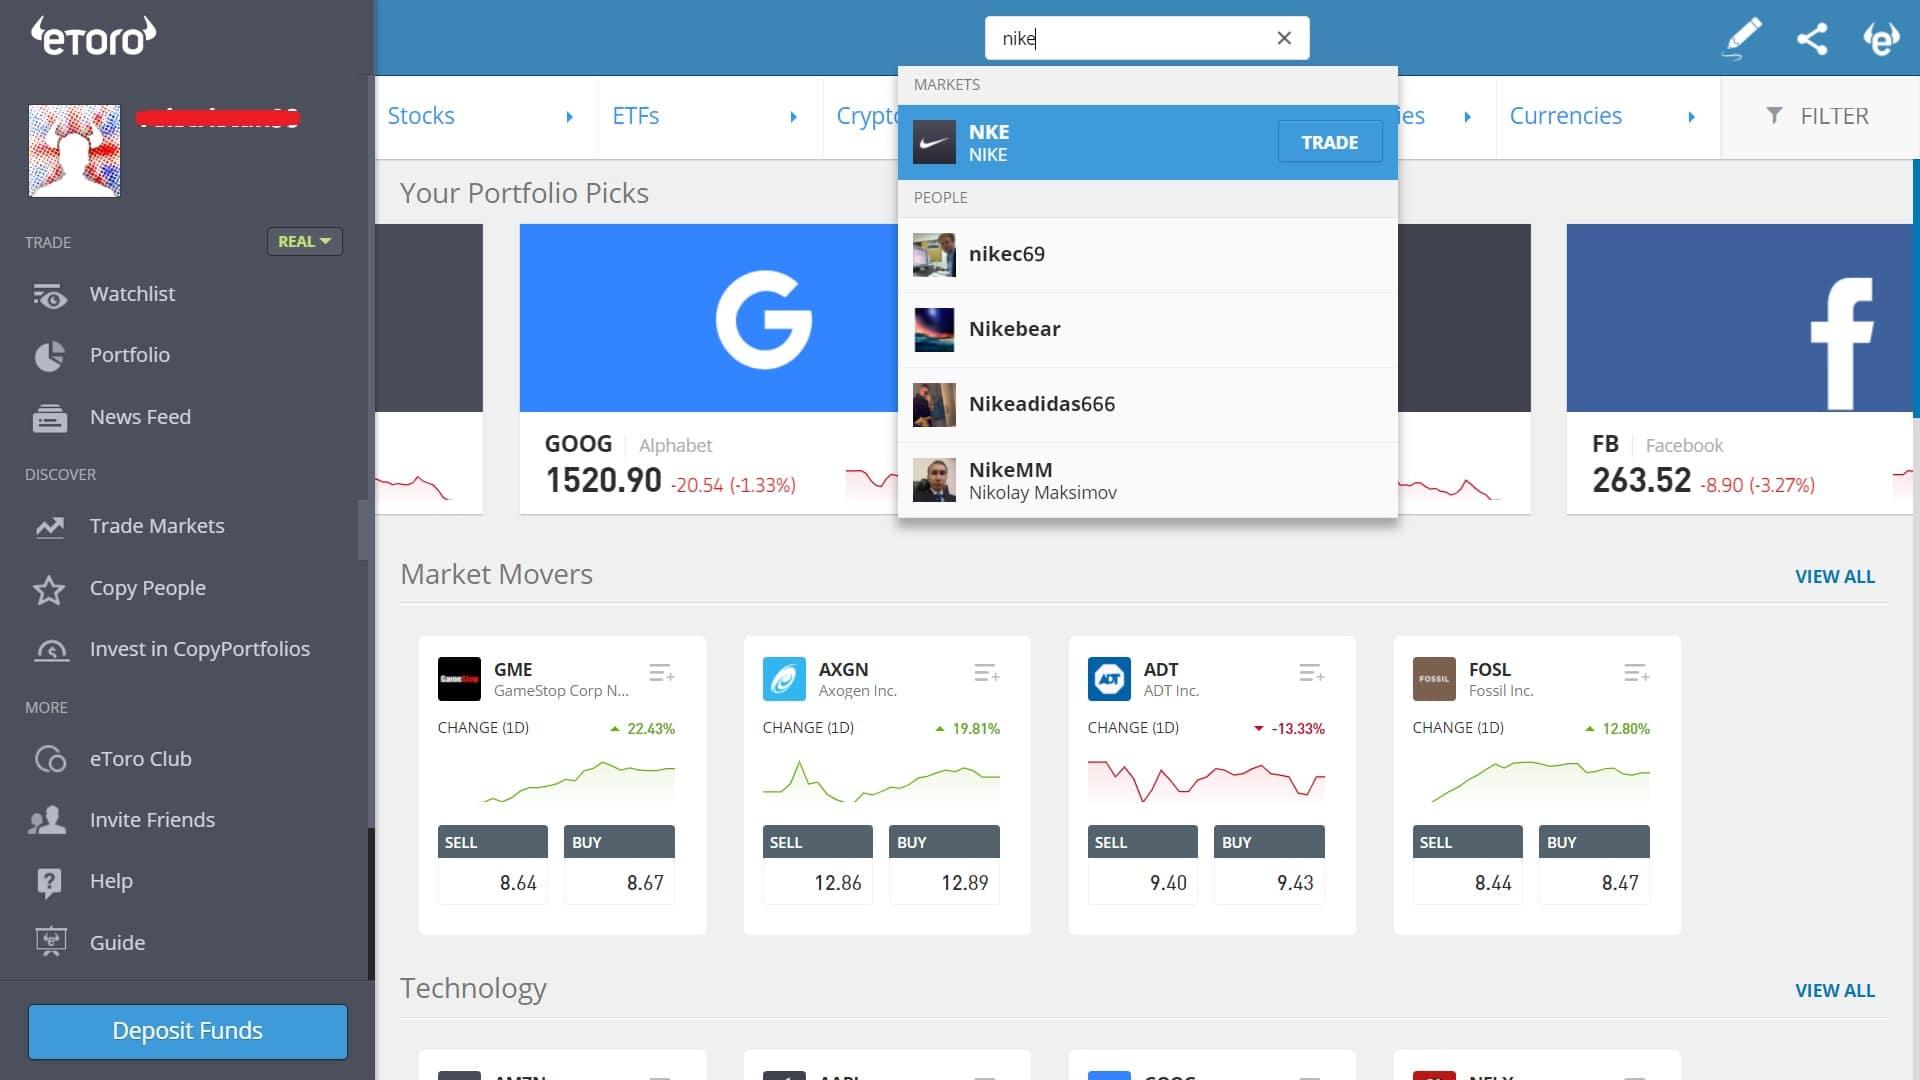 Searching for Nike stock on eToro's platform